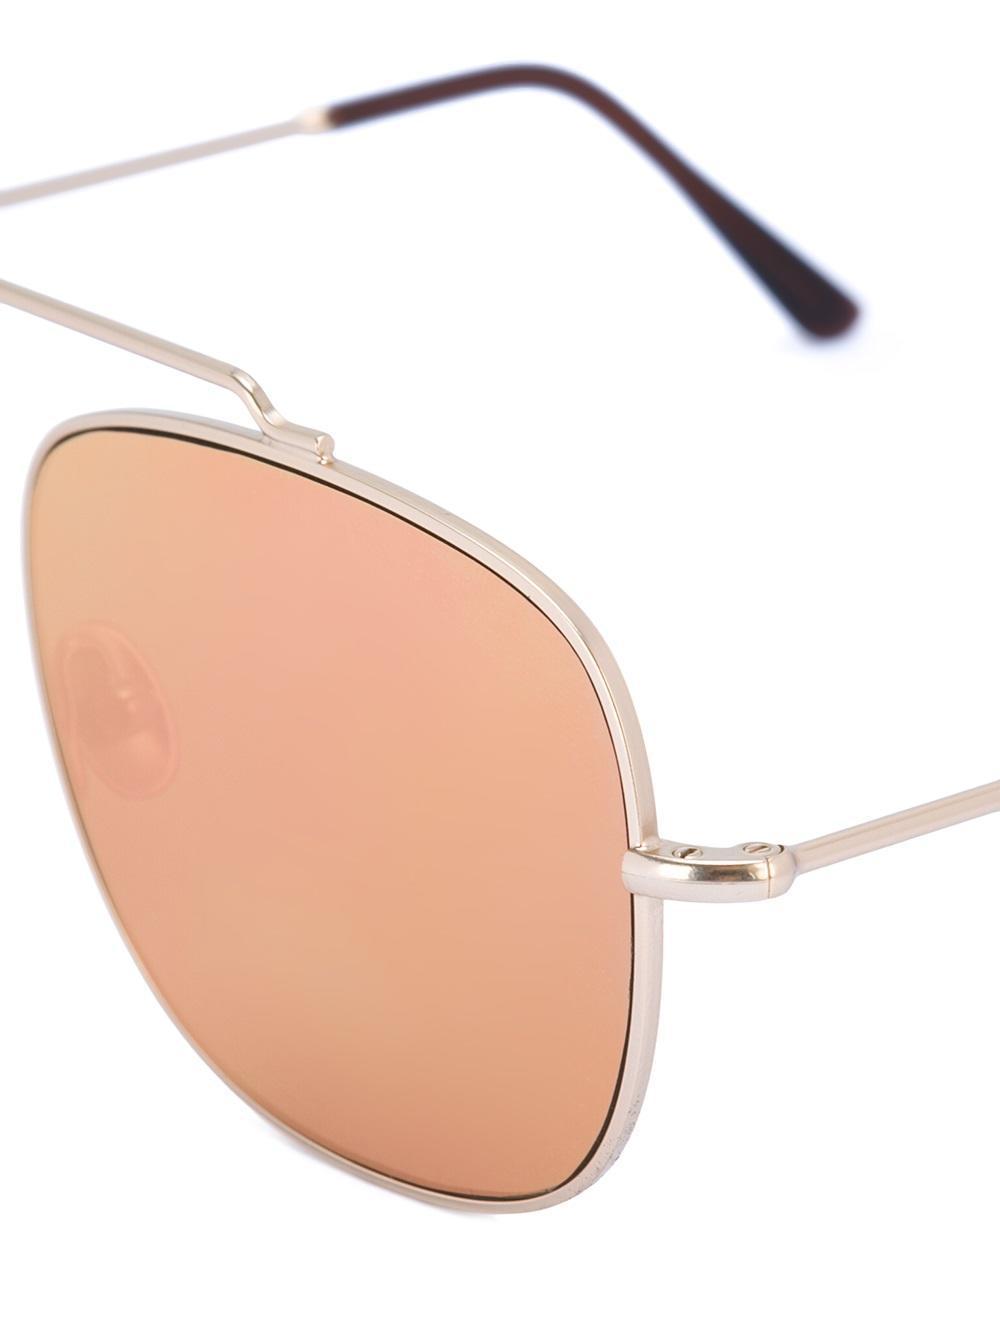 Spektre Montana Sunglasses in Metallic